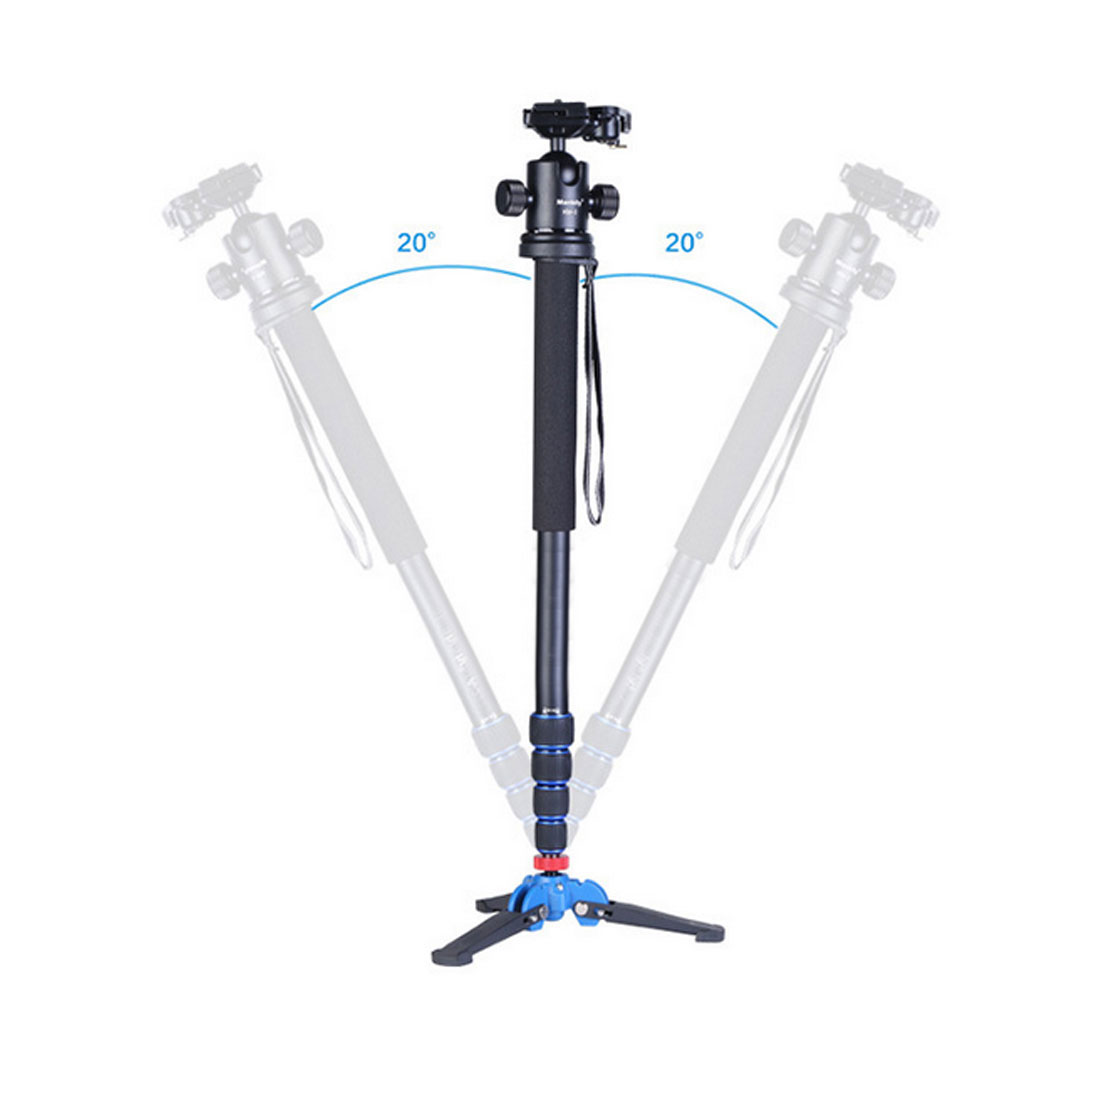 Hot 1pcs Carbon Fiber Camera Monopod Portable Professional DSLR Monopod For Canon Eos Nikon